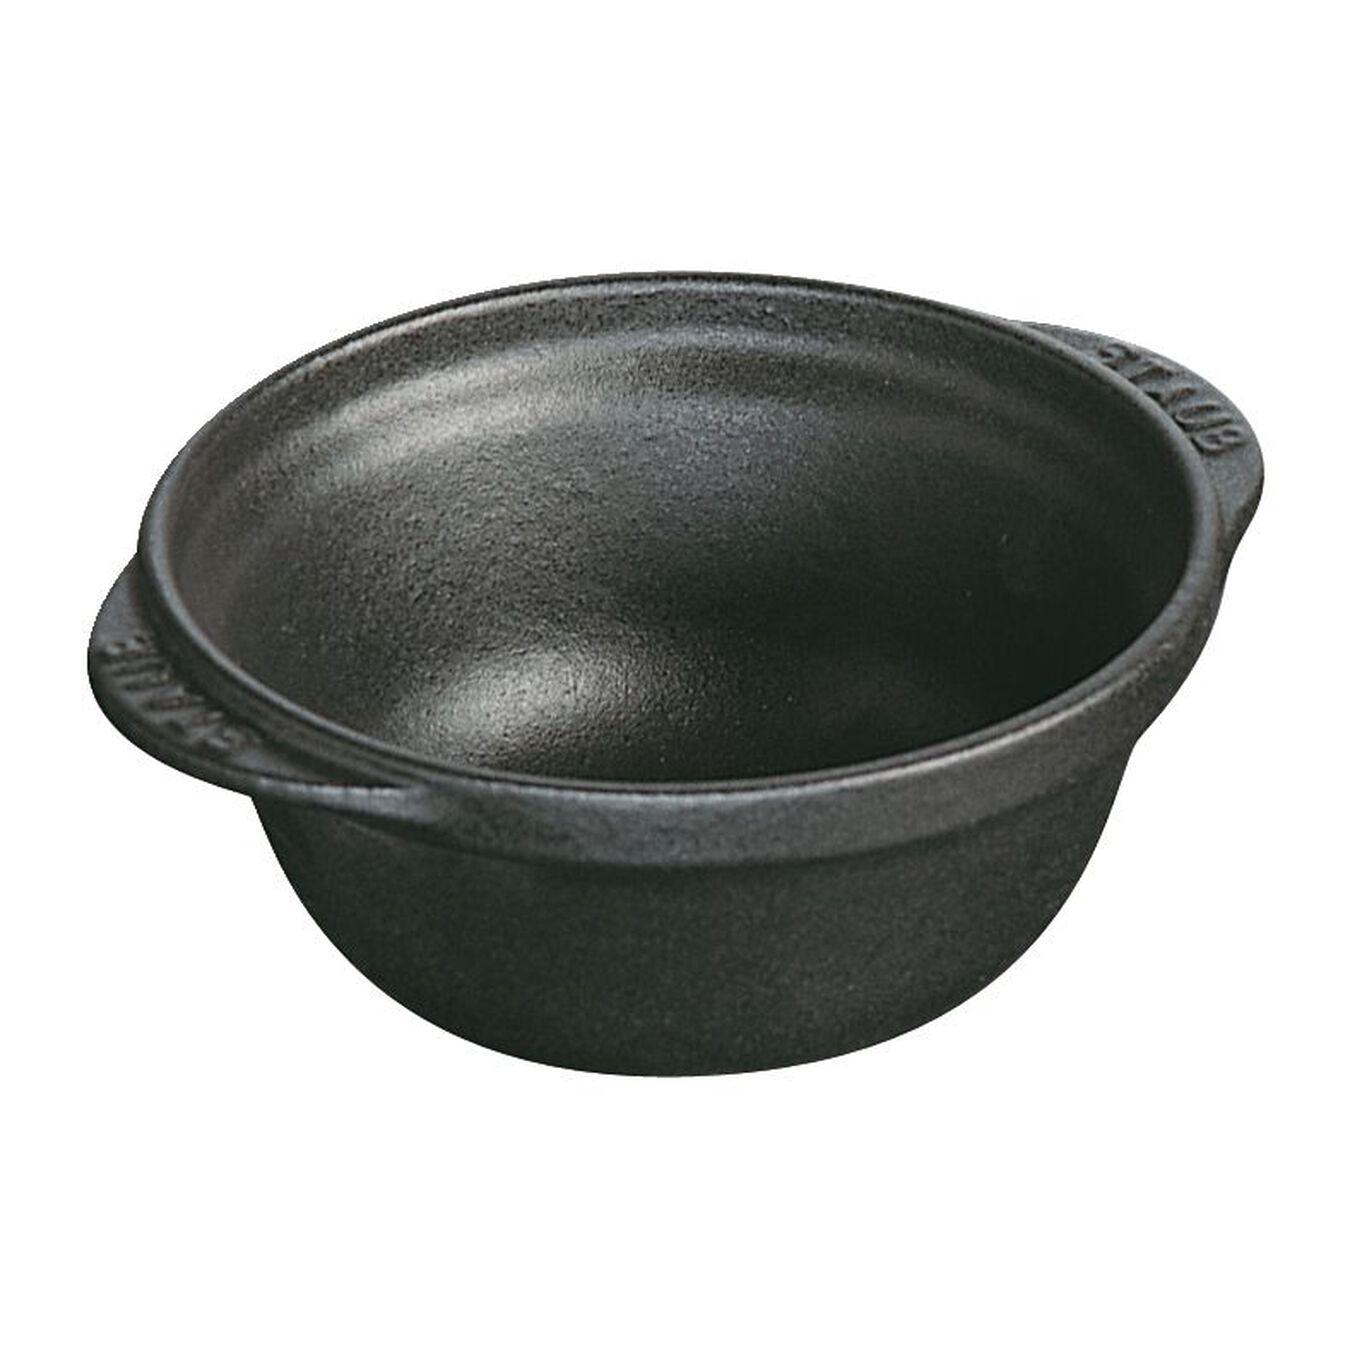 Ciotola rotonda - 12 cm, Nera,,large 1